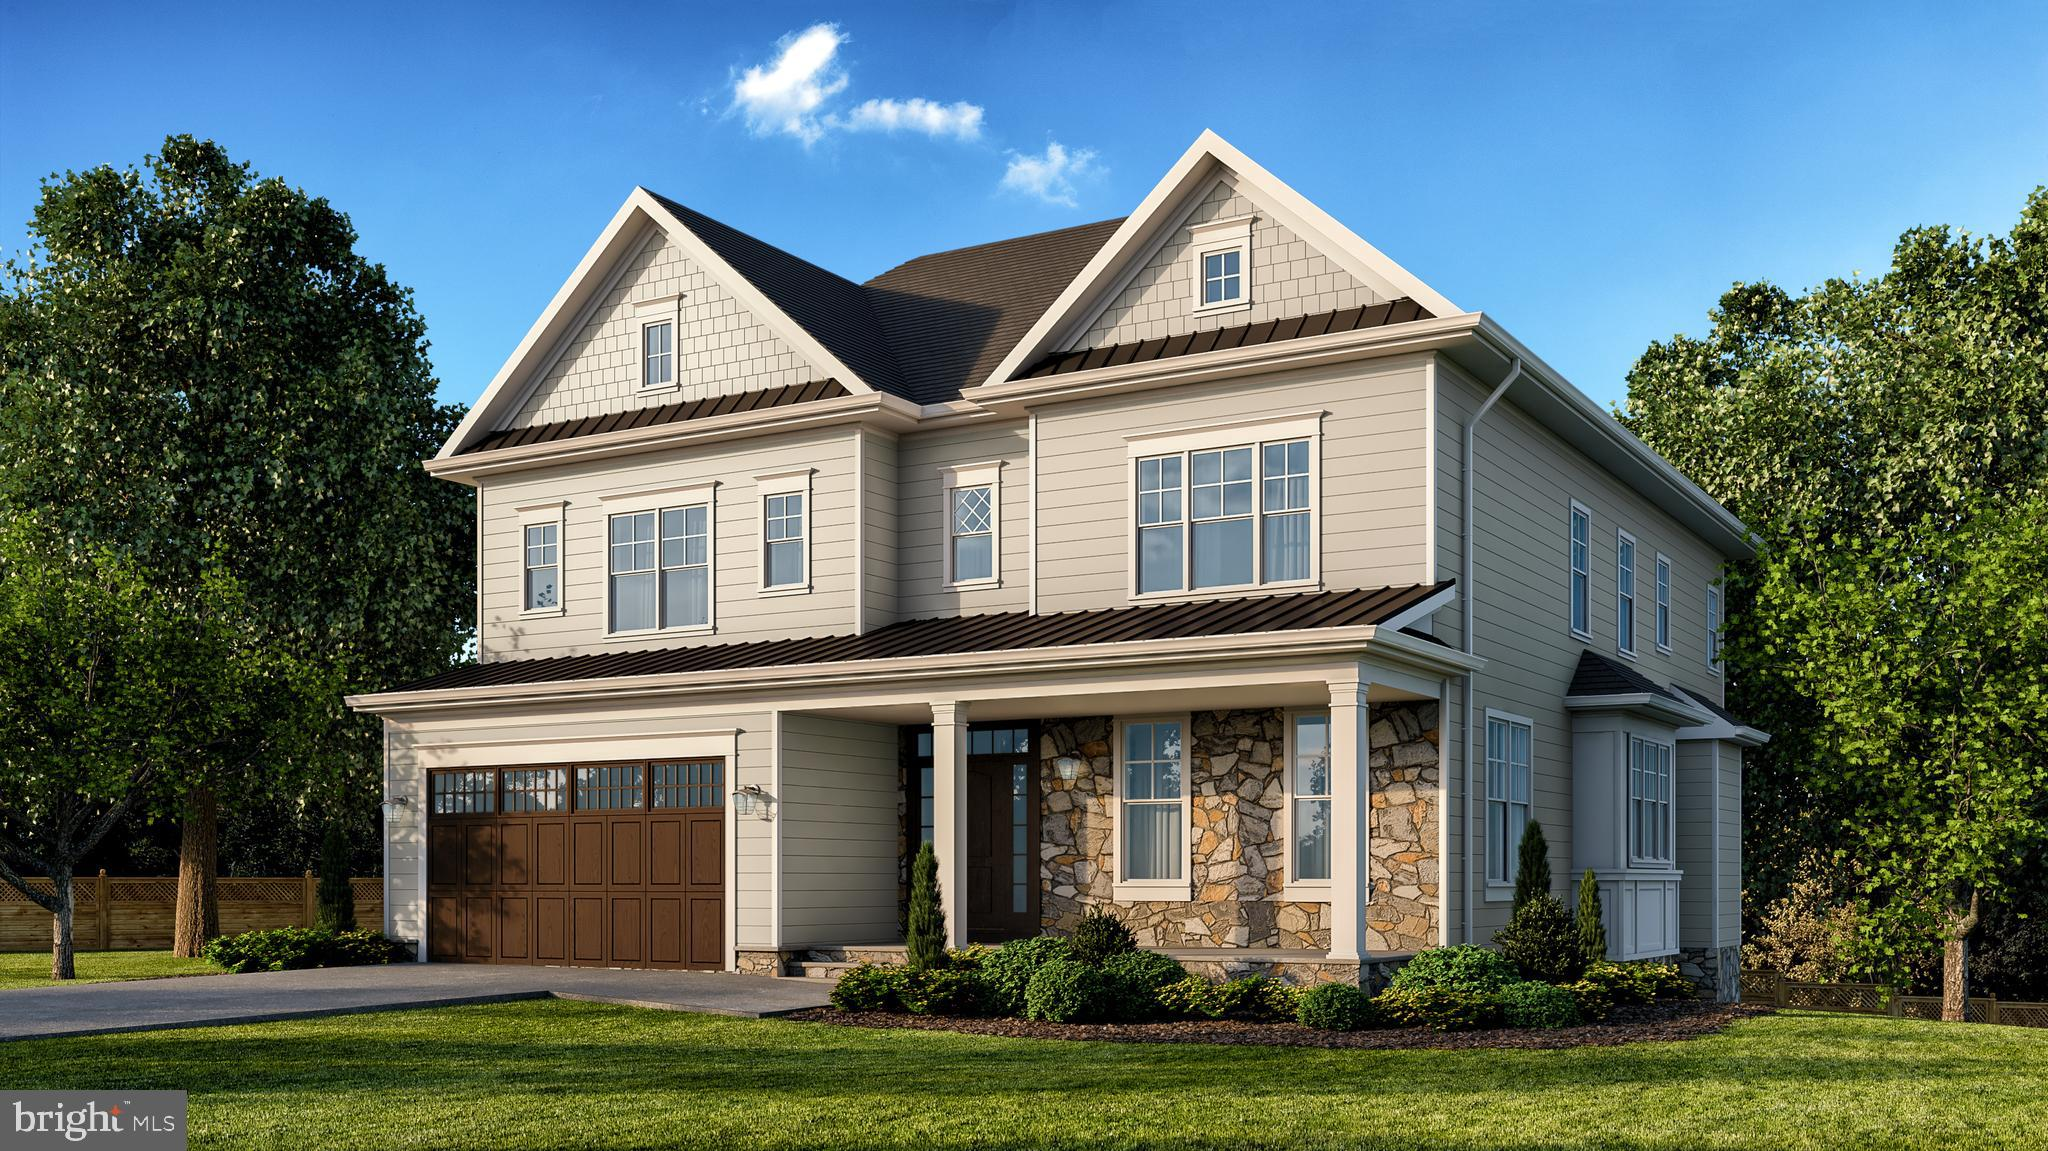 6620 Tucker Ave, Mclean, VA, 22101